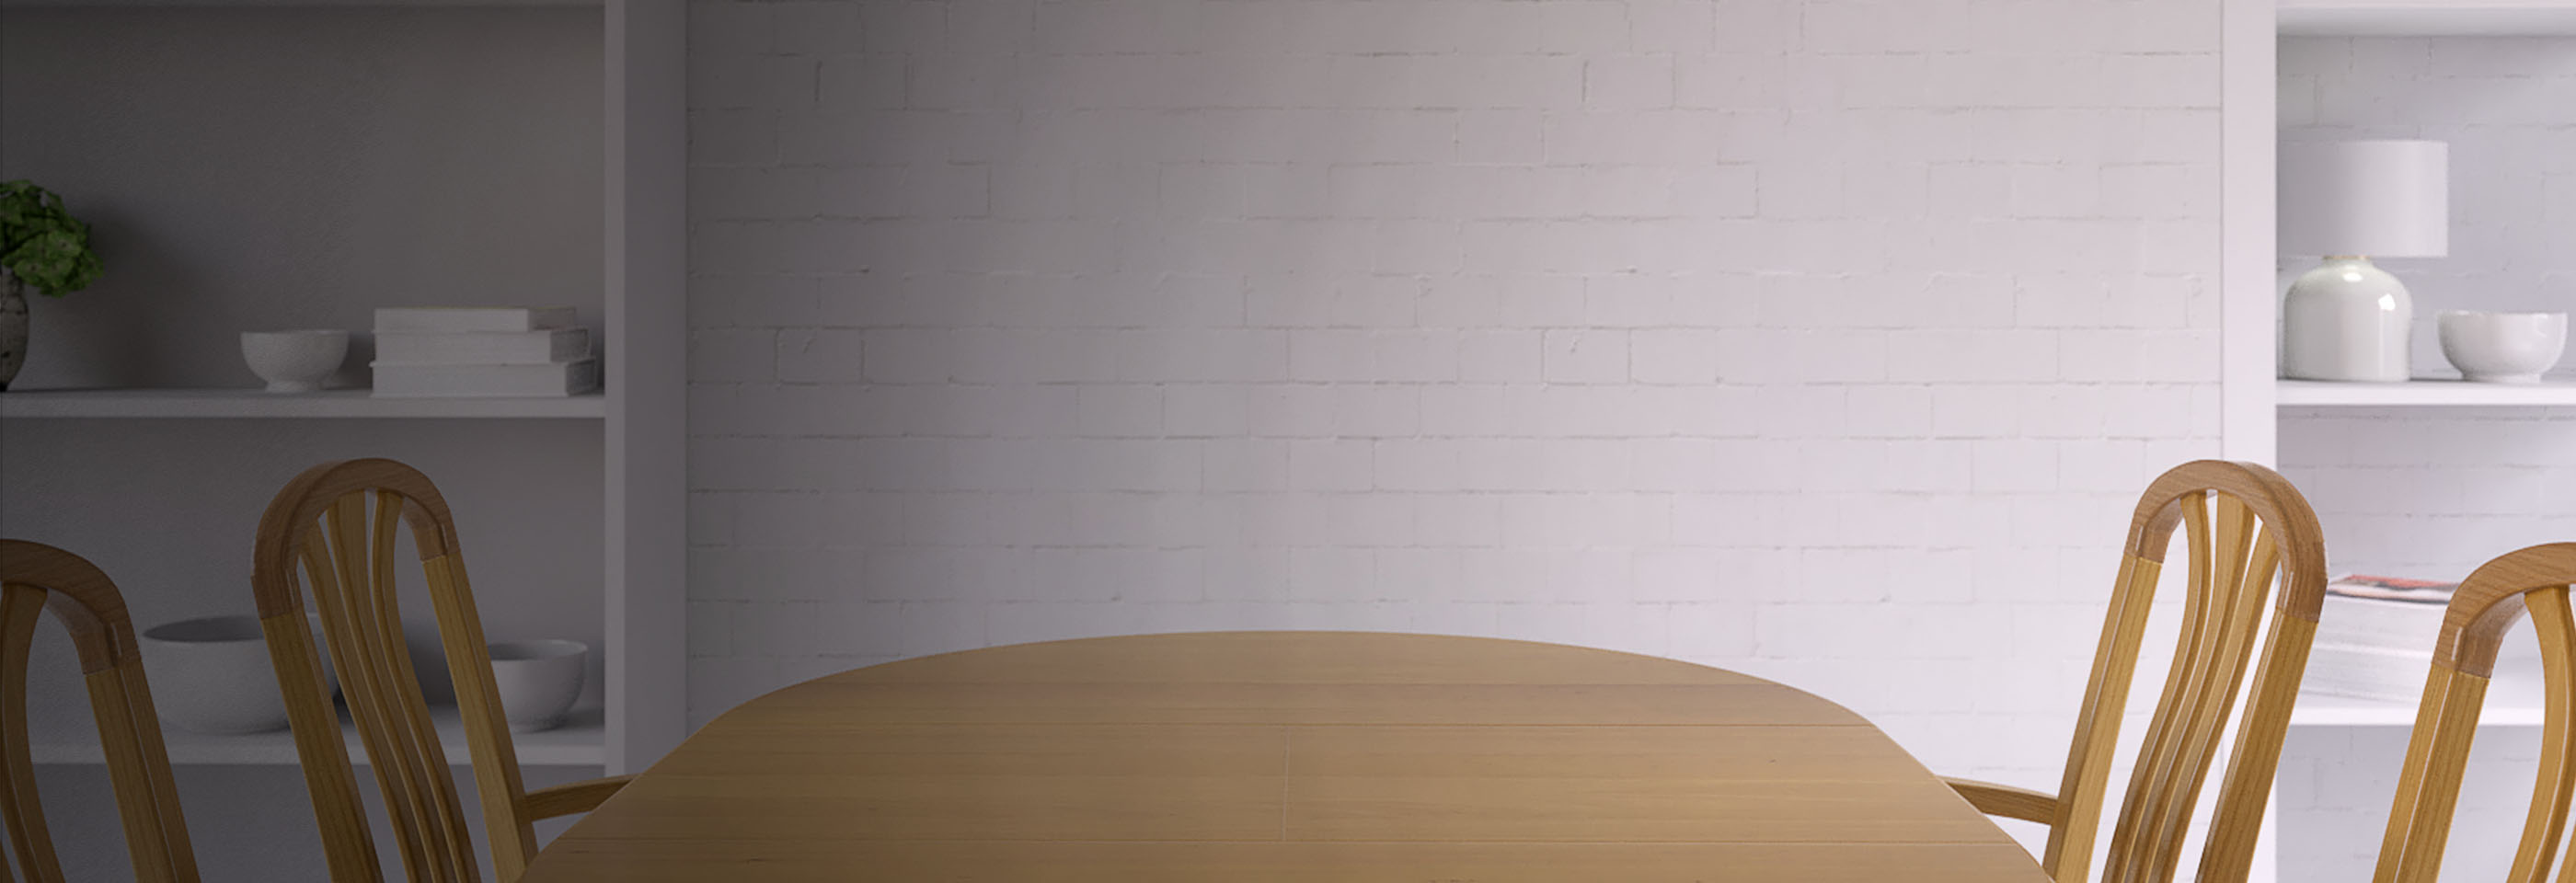 trafalgar furniture